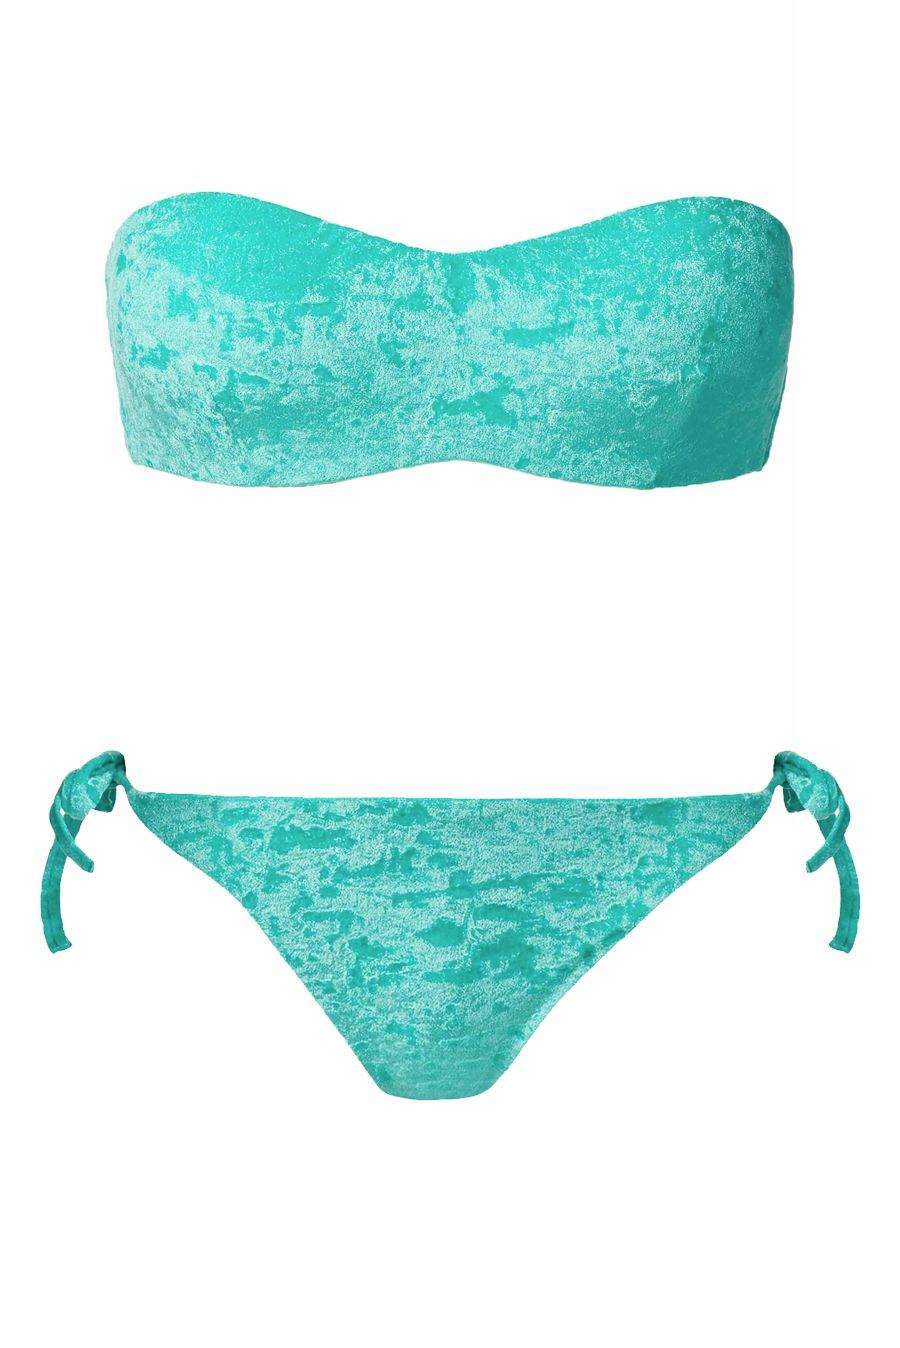 afcf1916017b Bikinis que se ajustan a tu cuerpo | Women's fashion | Bikinis, Moda ...